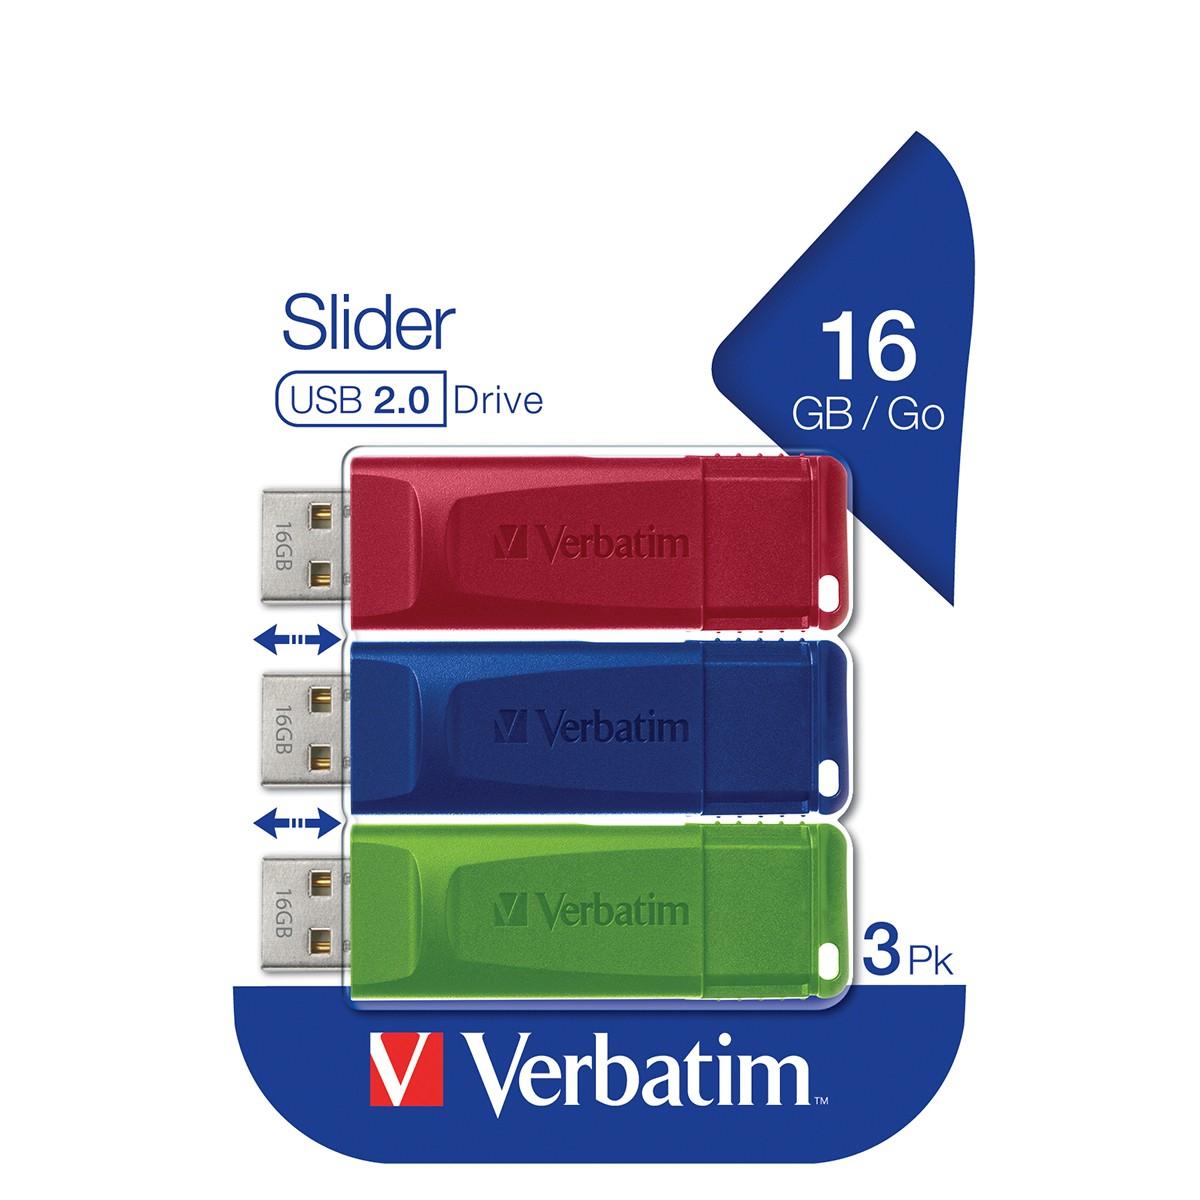 Verbatim 16GB USB Drives 3 Pack - Red, Blue and Green £9.99 @ Robert Dyas